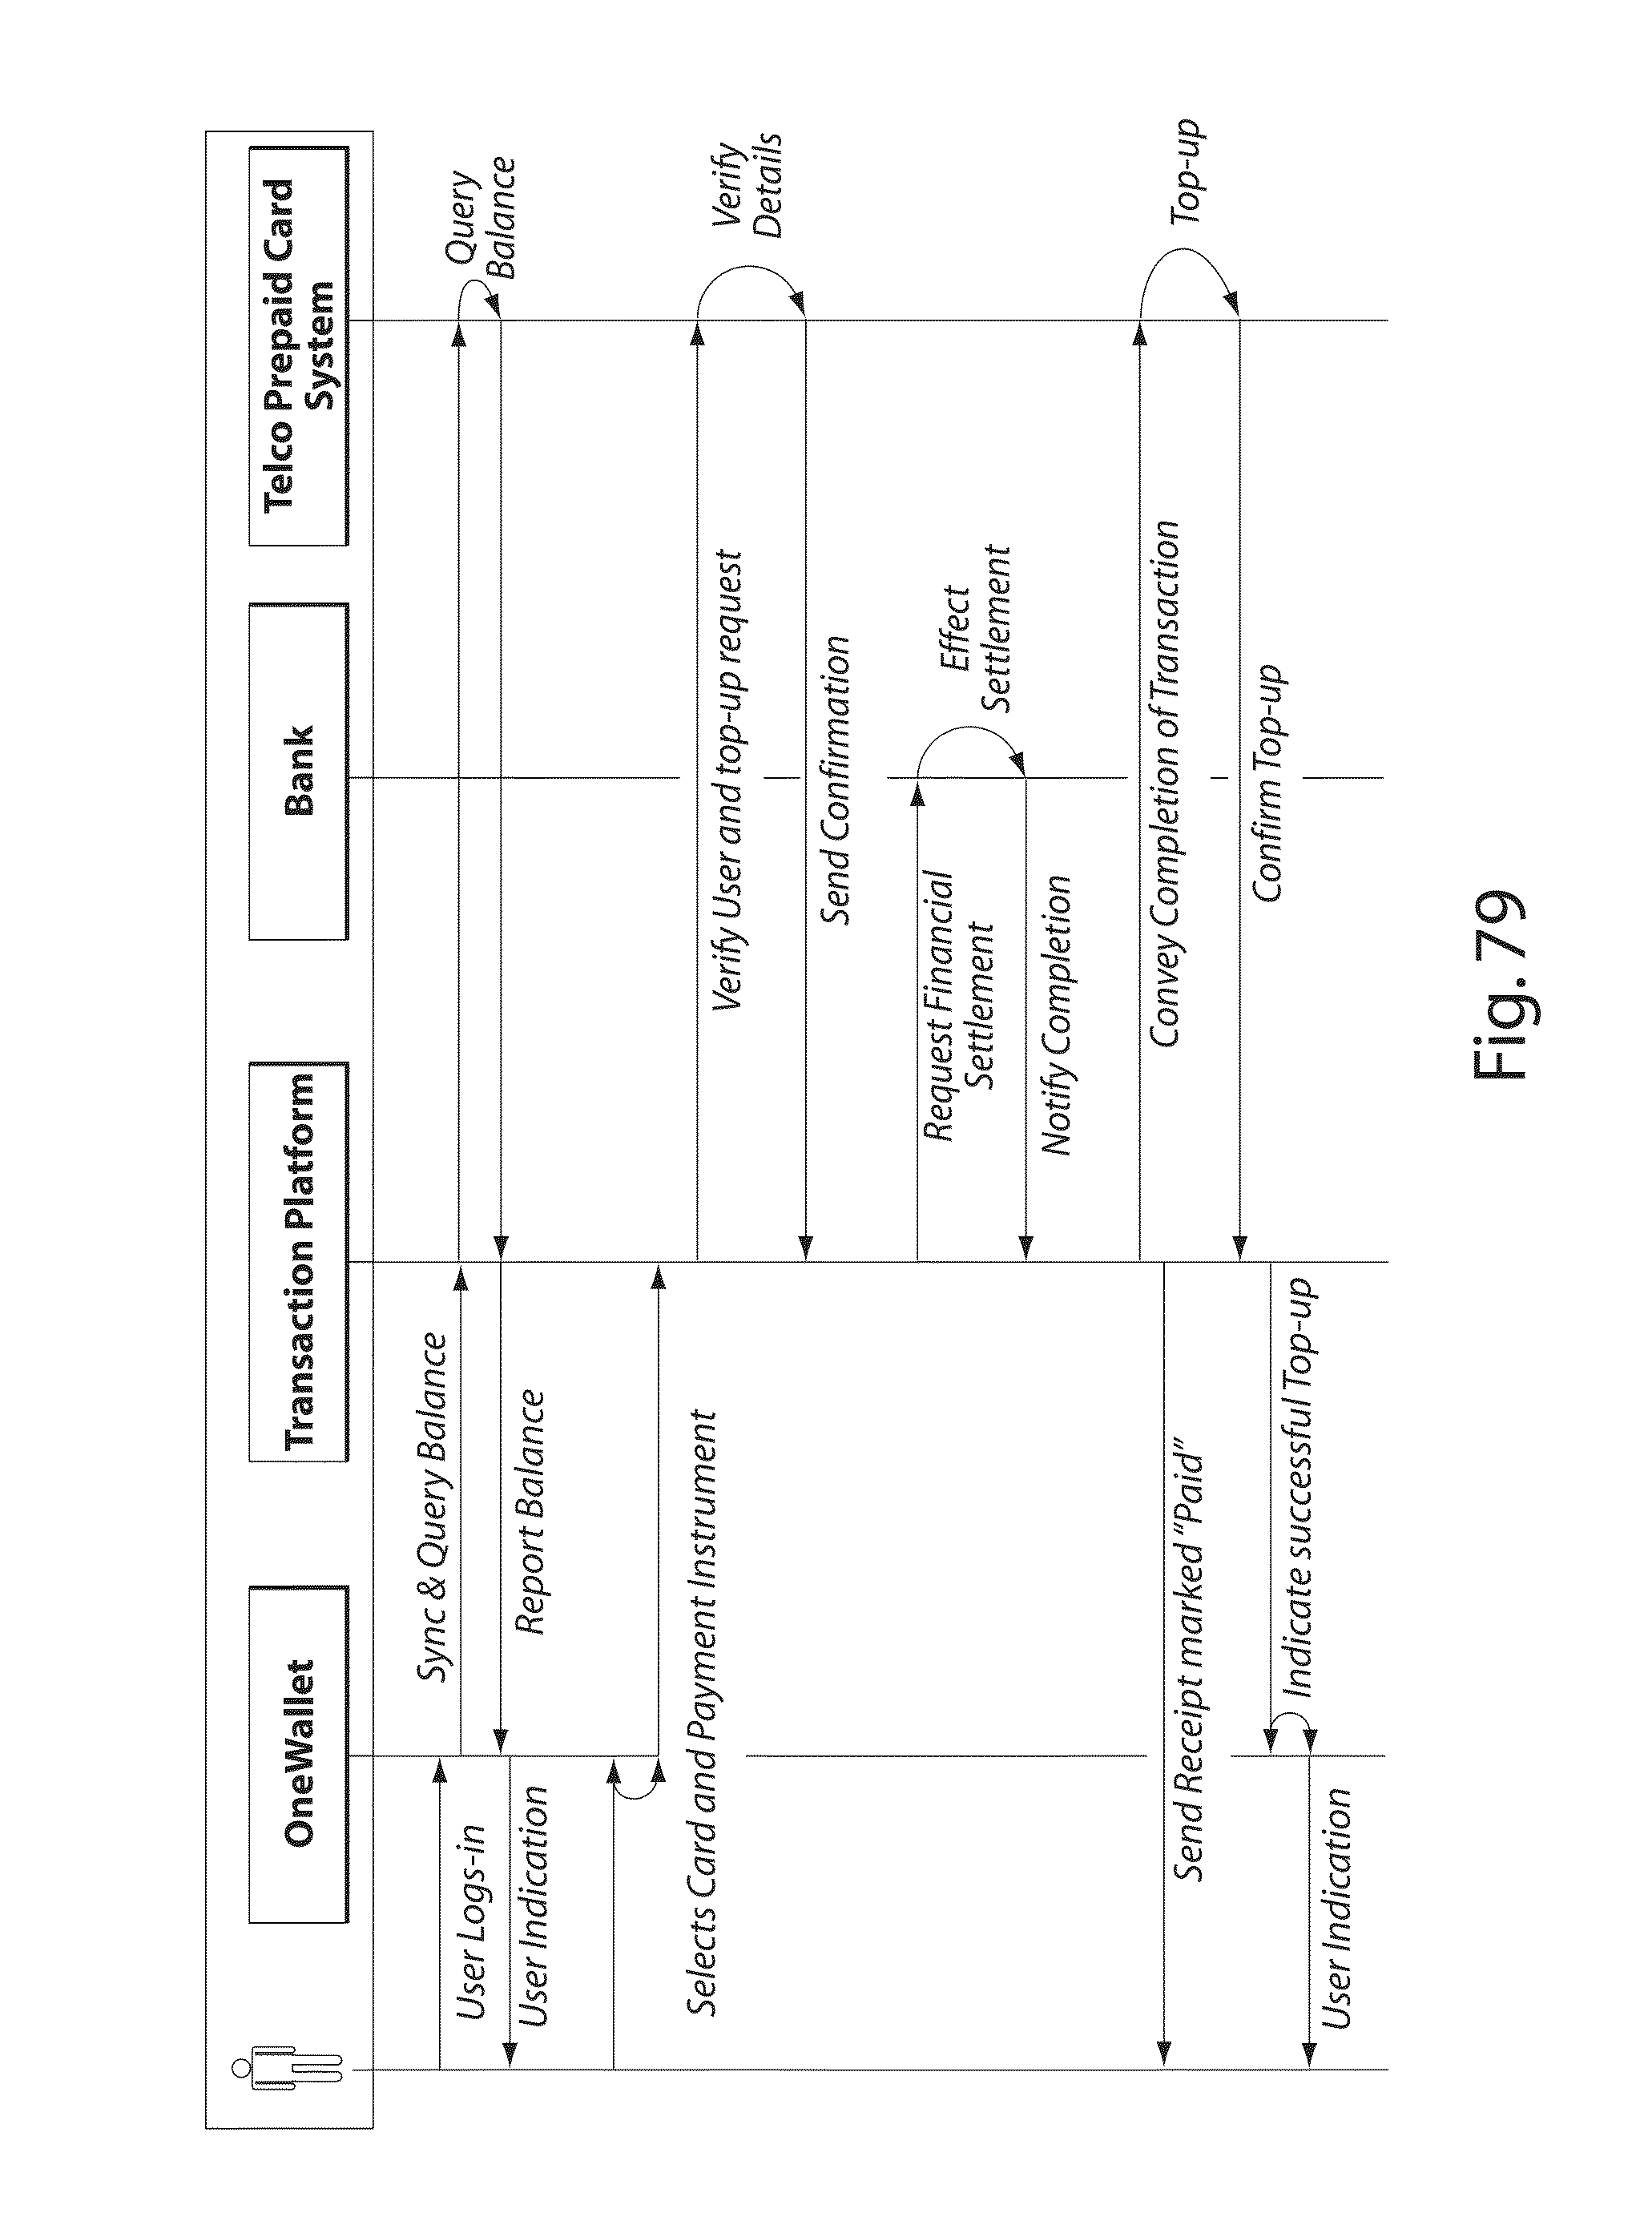 Patent US 9,330,390 B2